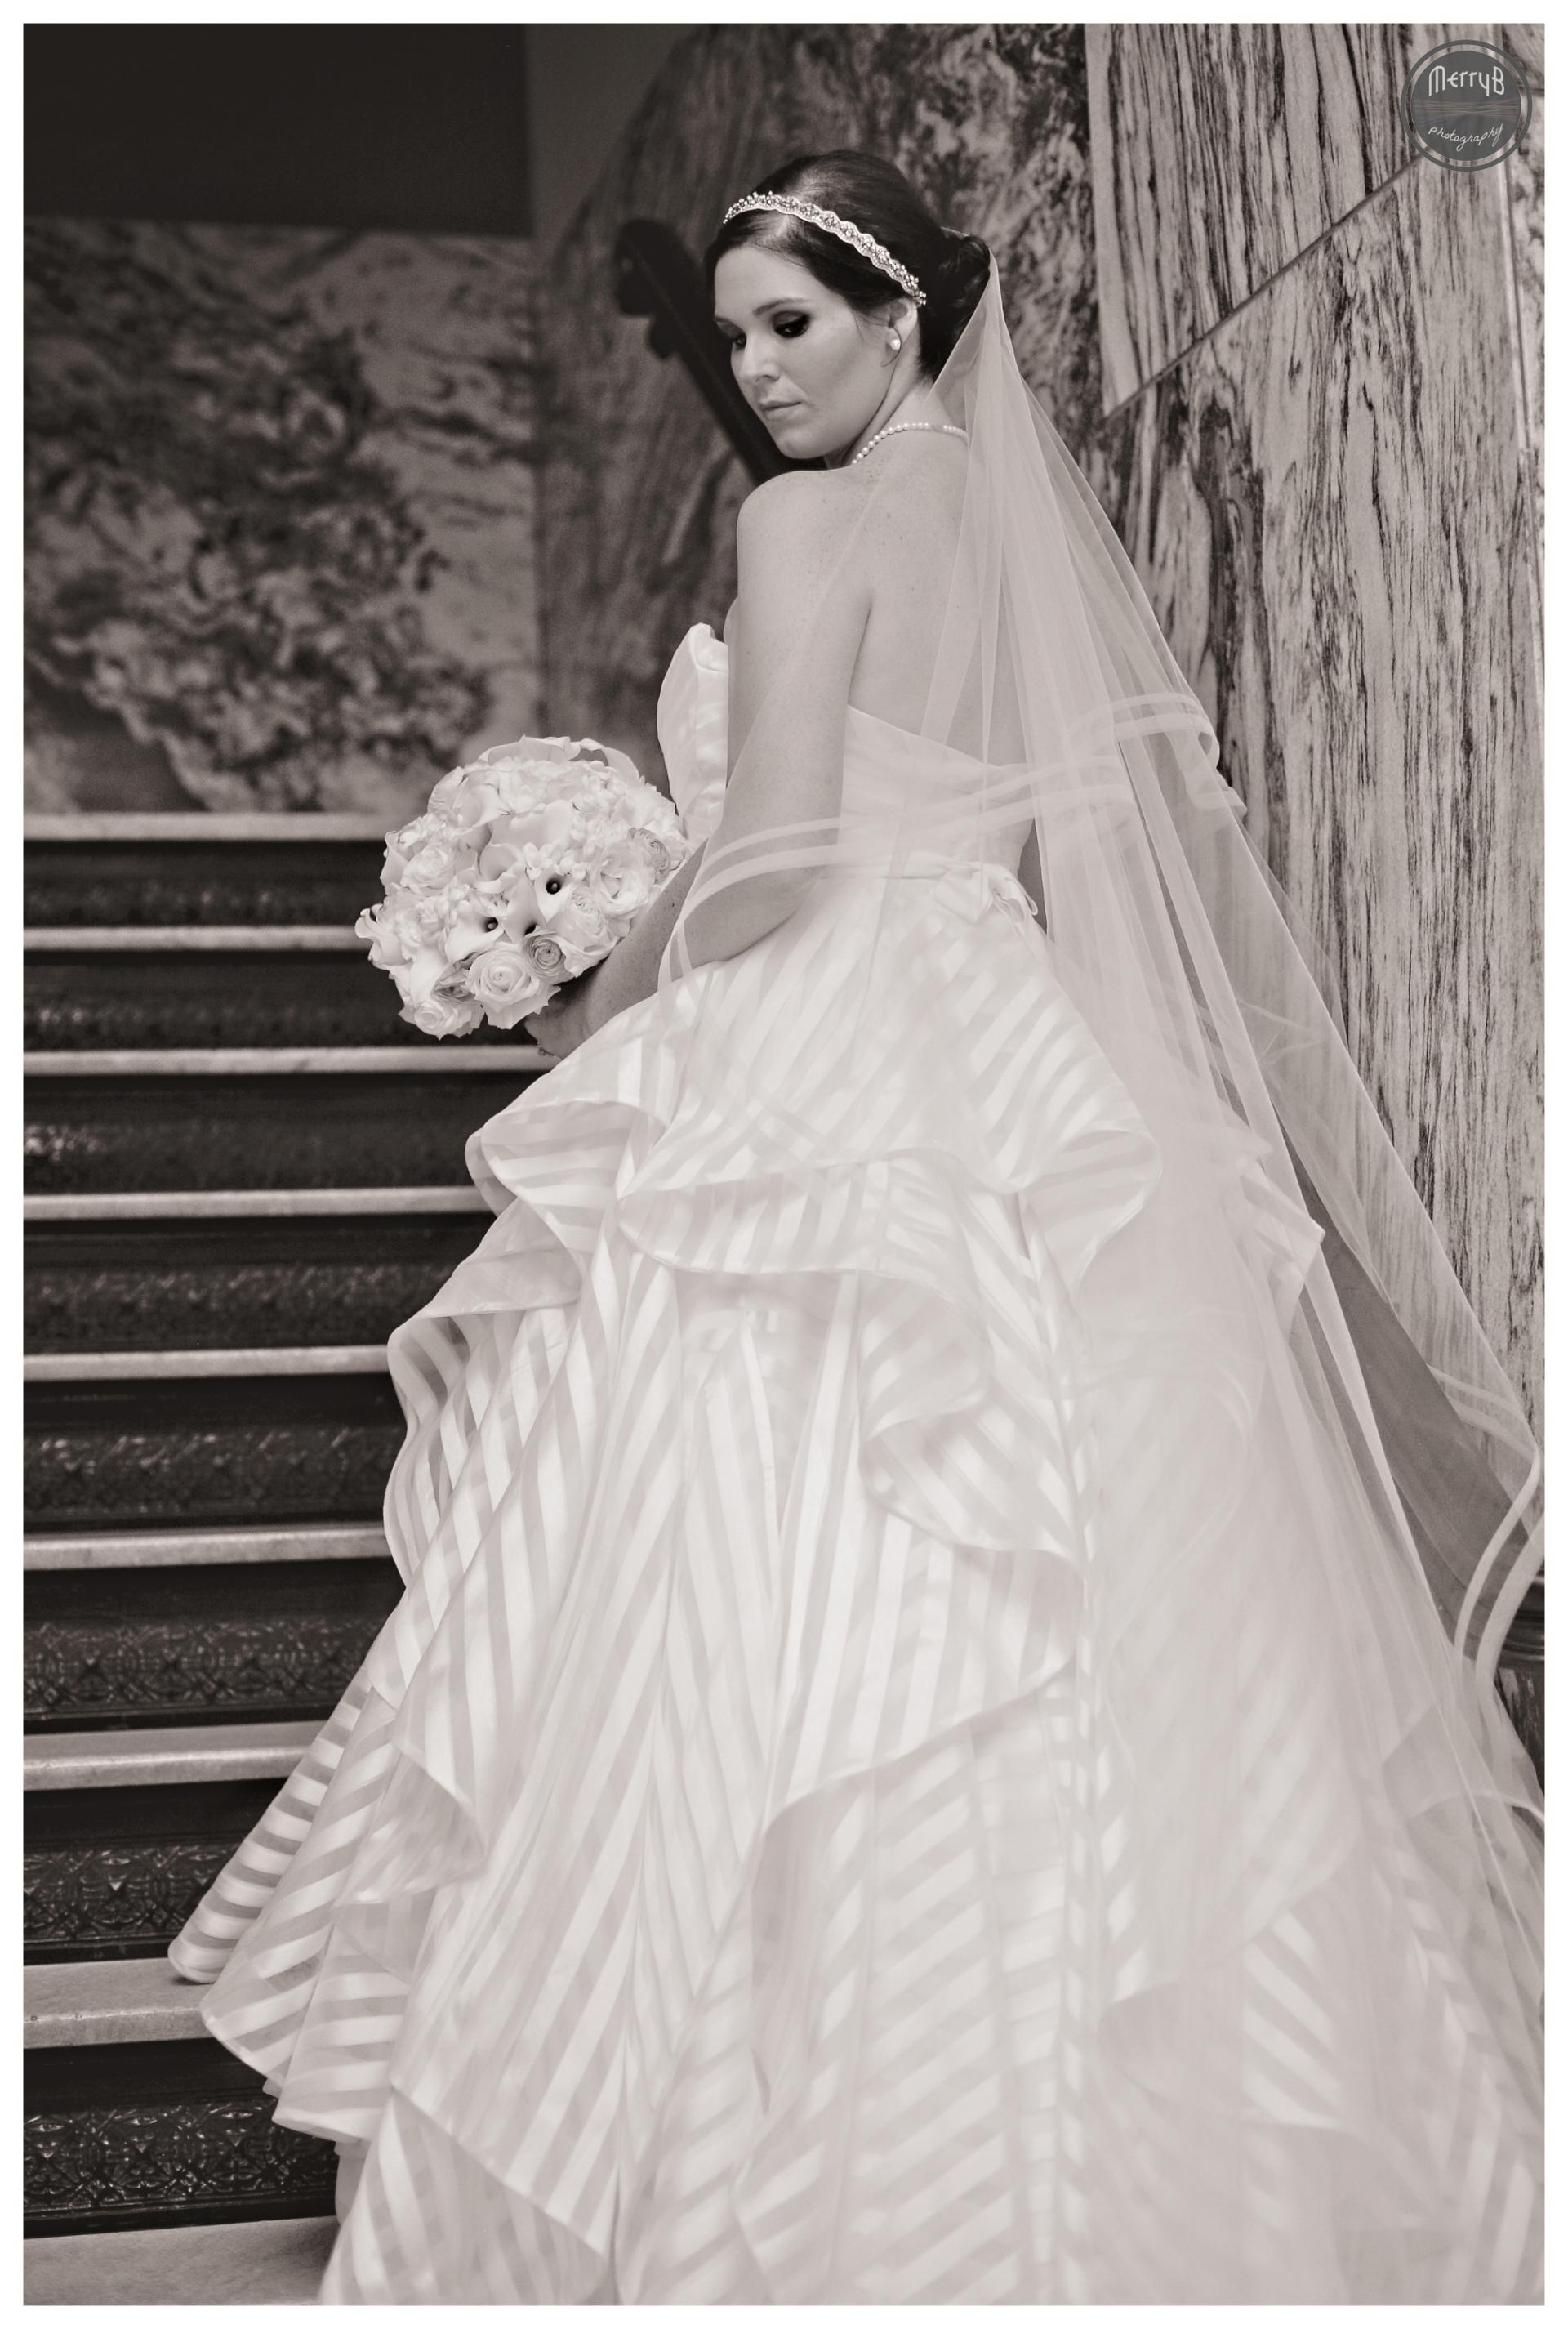 mal+jesse wedding0030